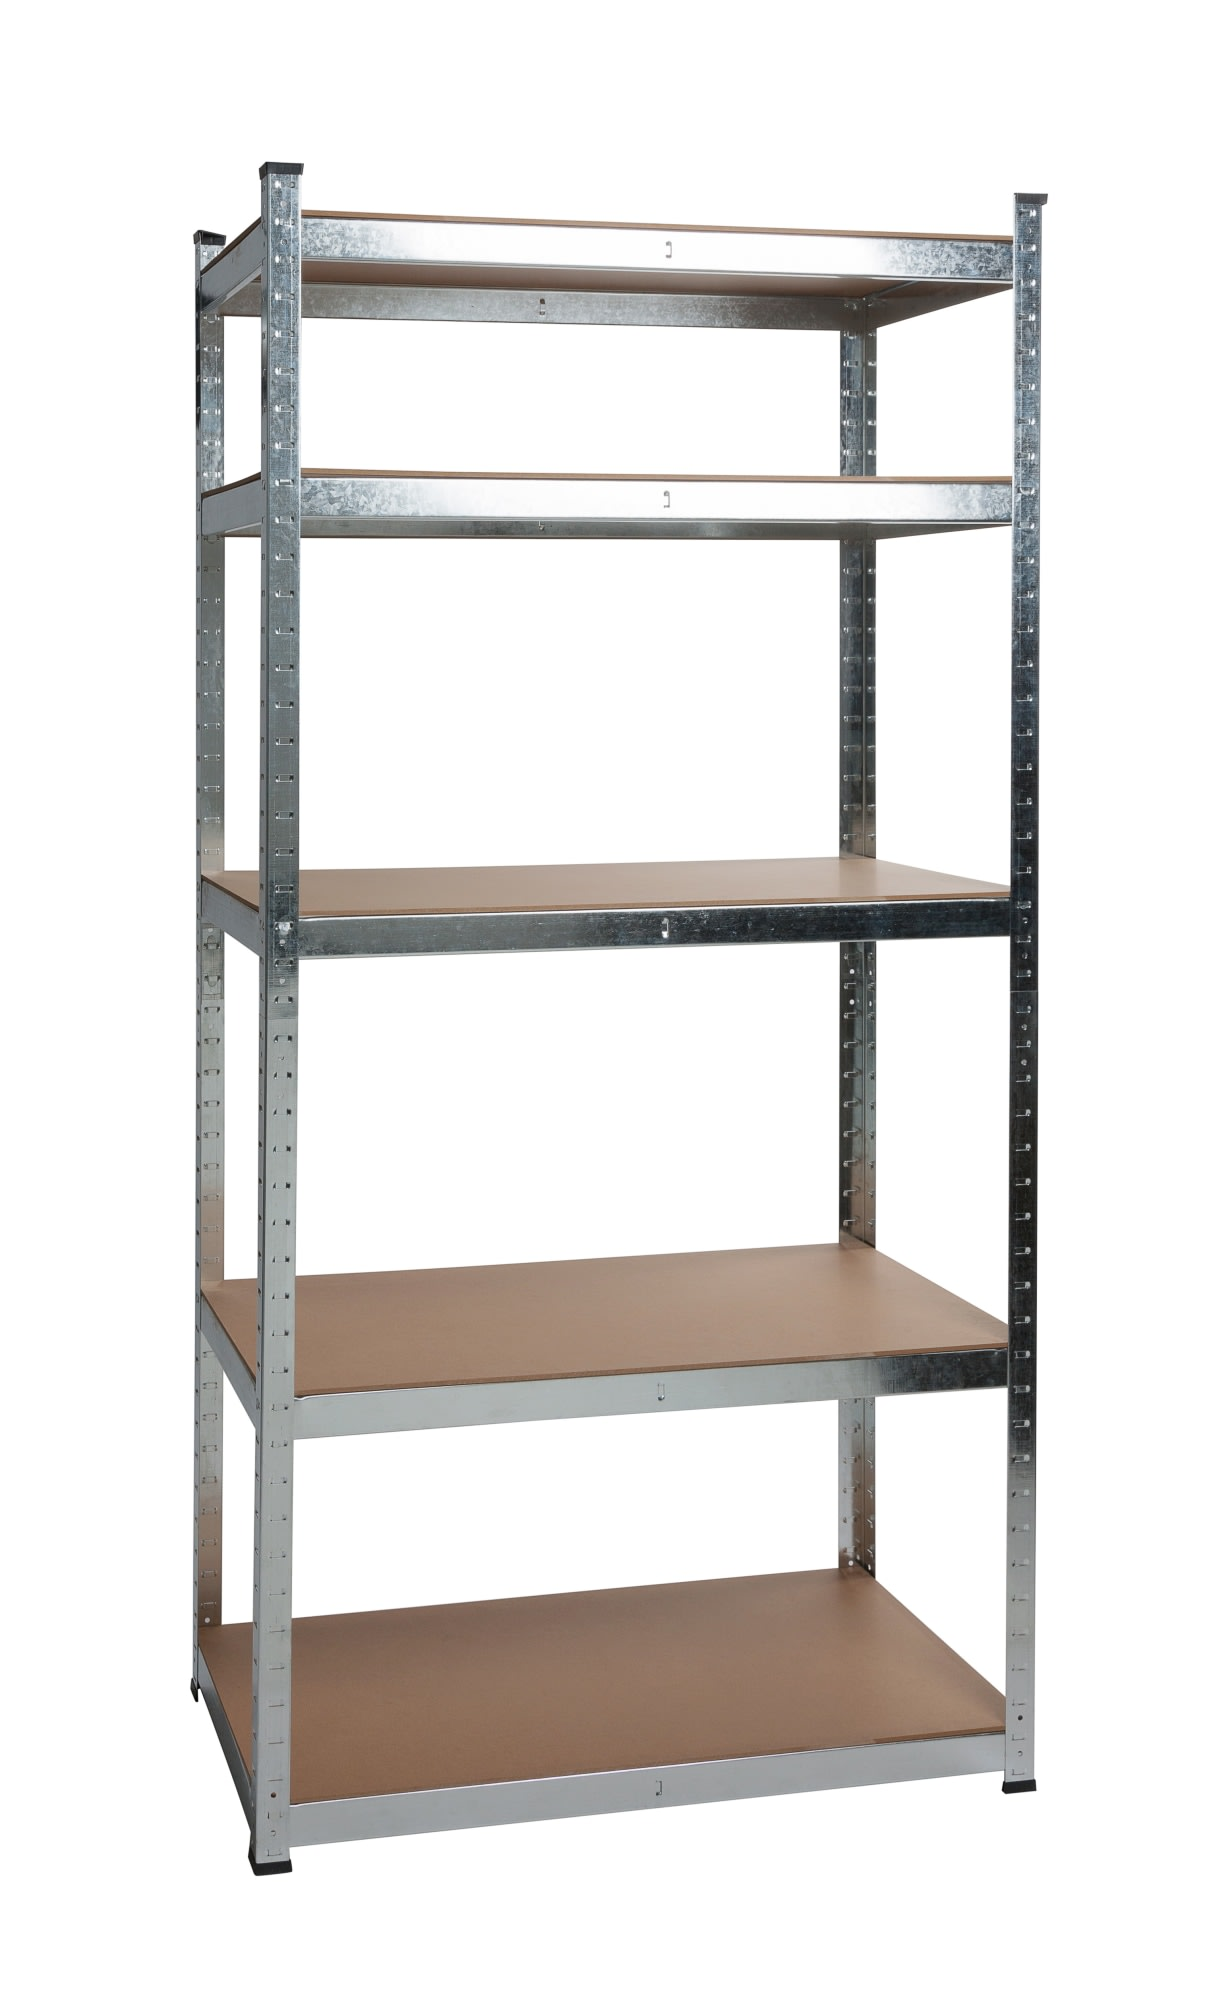 Varastohylly metallia, 5 tasoa175 kg | tokmanni.fi